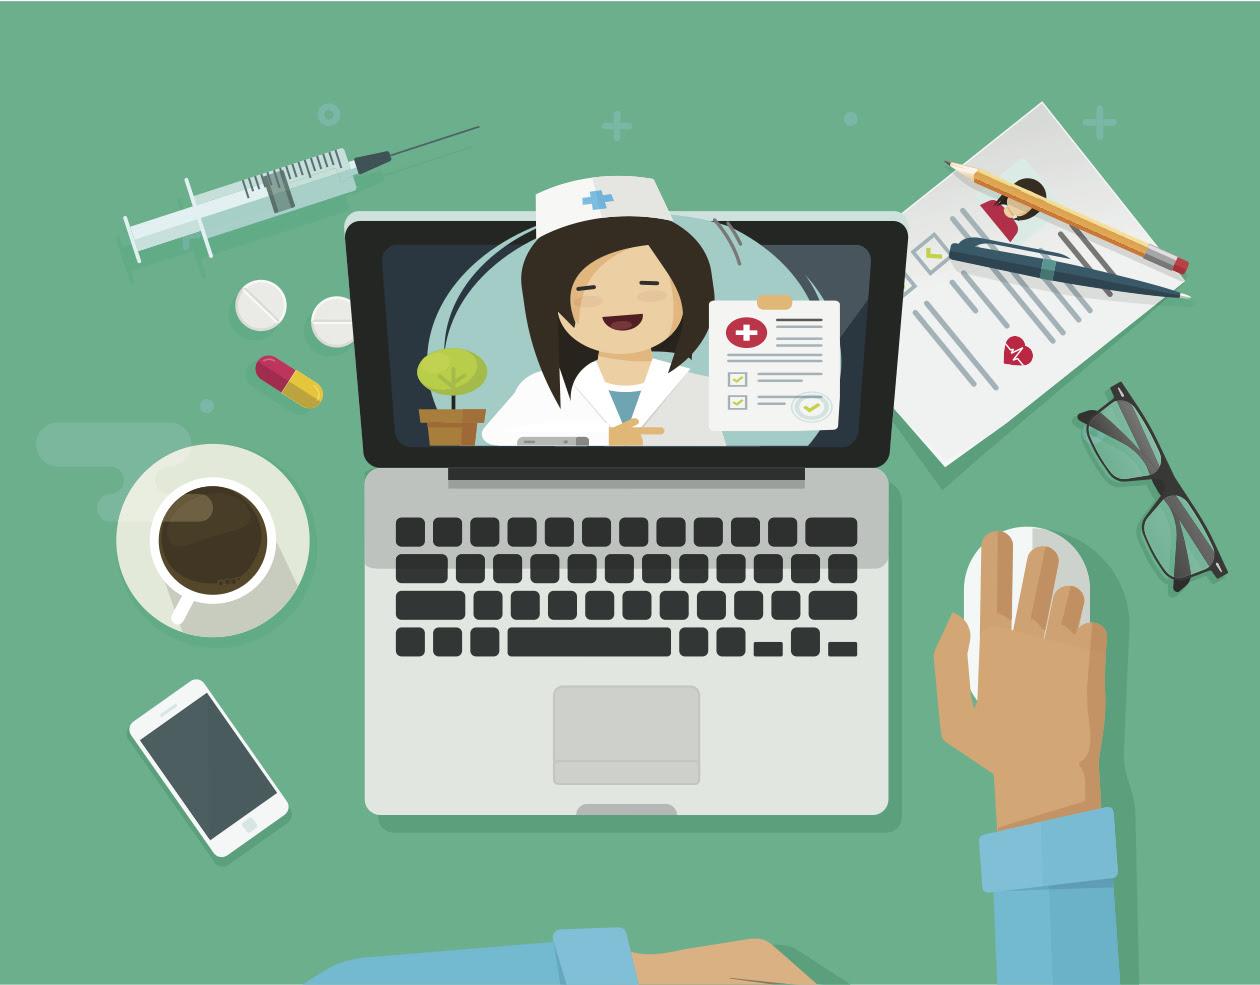 Healthsite telehealth services